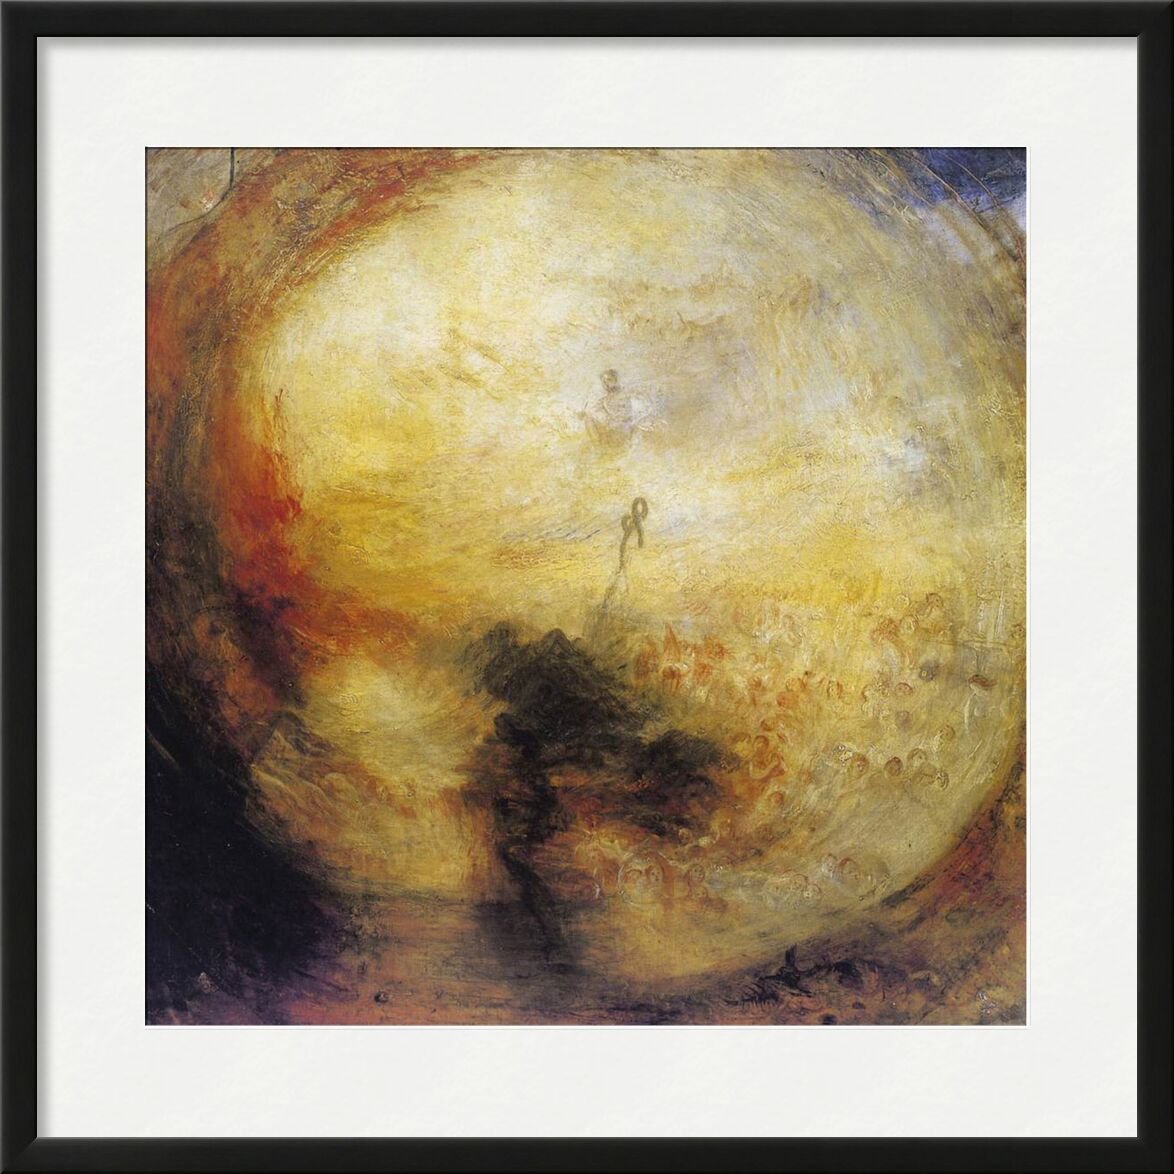 The Morning after the Deluge - WILLIAM TURNER 1843 from Aux Beaux-Arts, Prodi Art, Last judgement, revelation, apocalypse, living, soul, downpour, death, storm, God, WILLIAM TURNER, painting